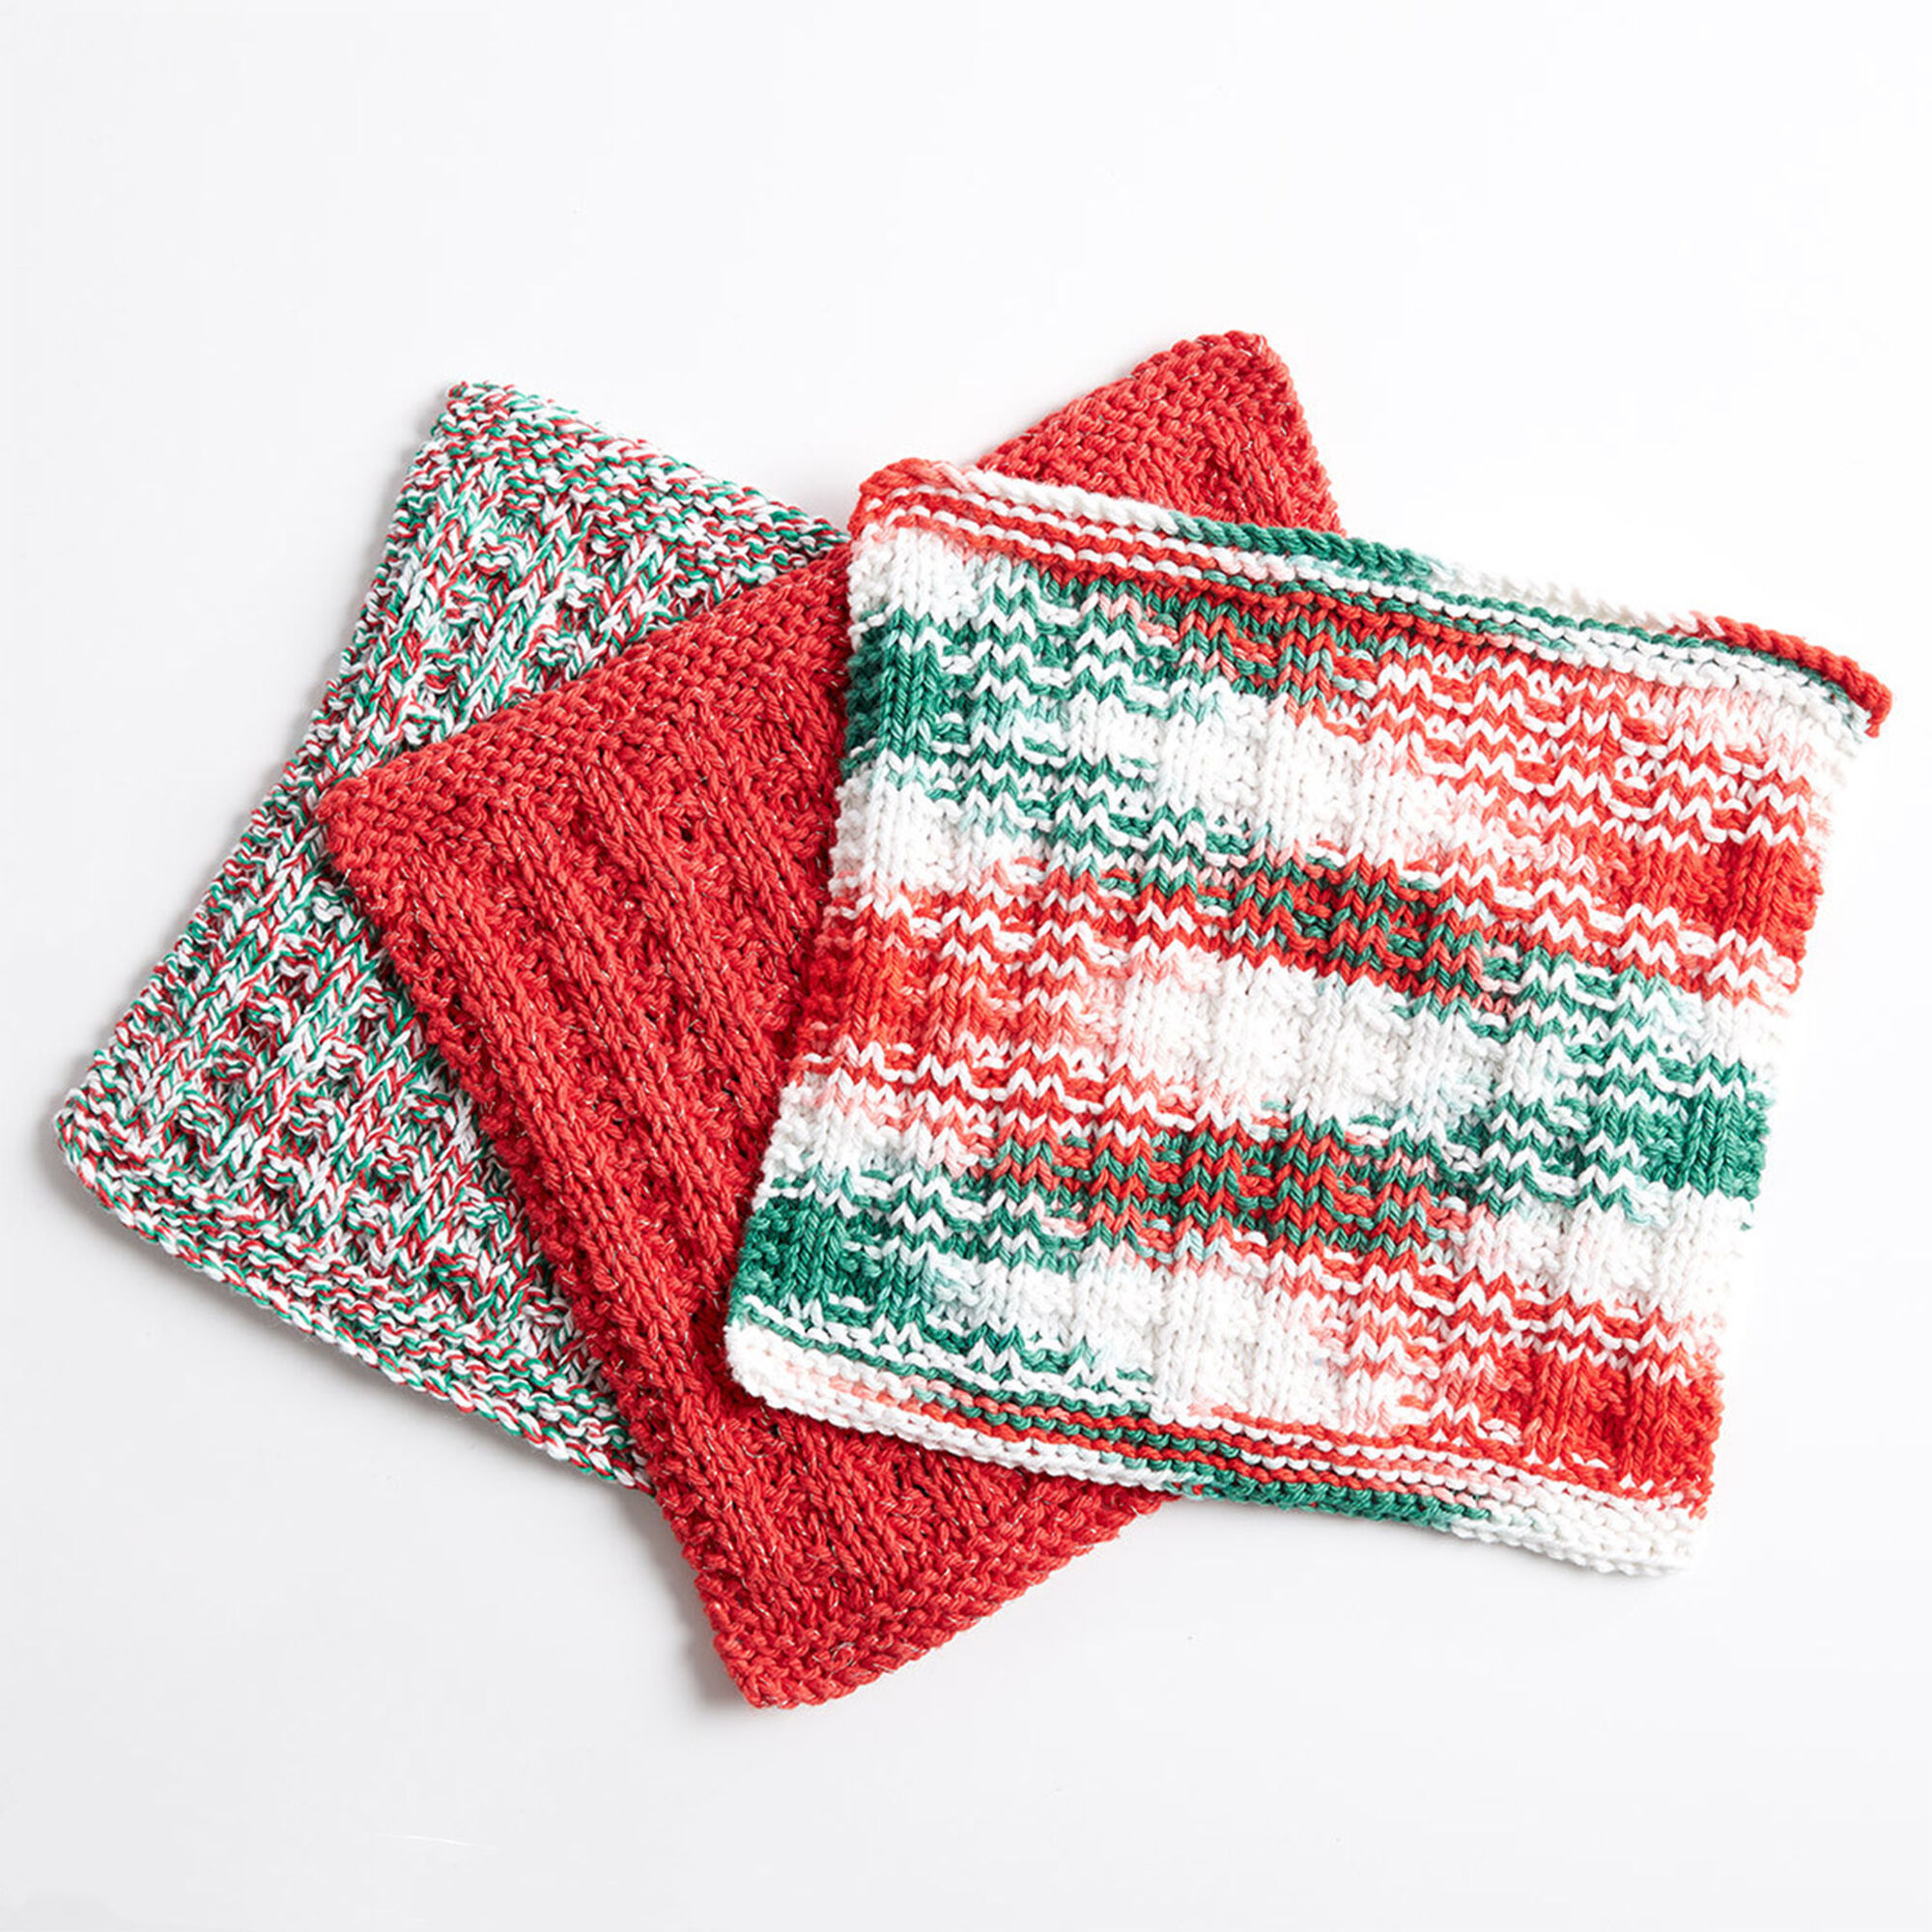 Bernat Holly Jolly Knit Dishcloth, Version 1 | Yarnspirations